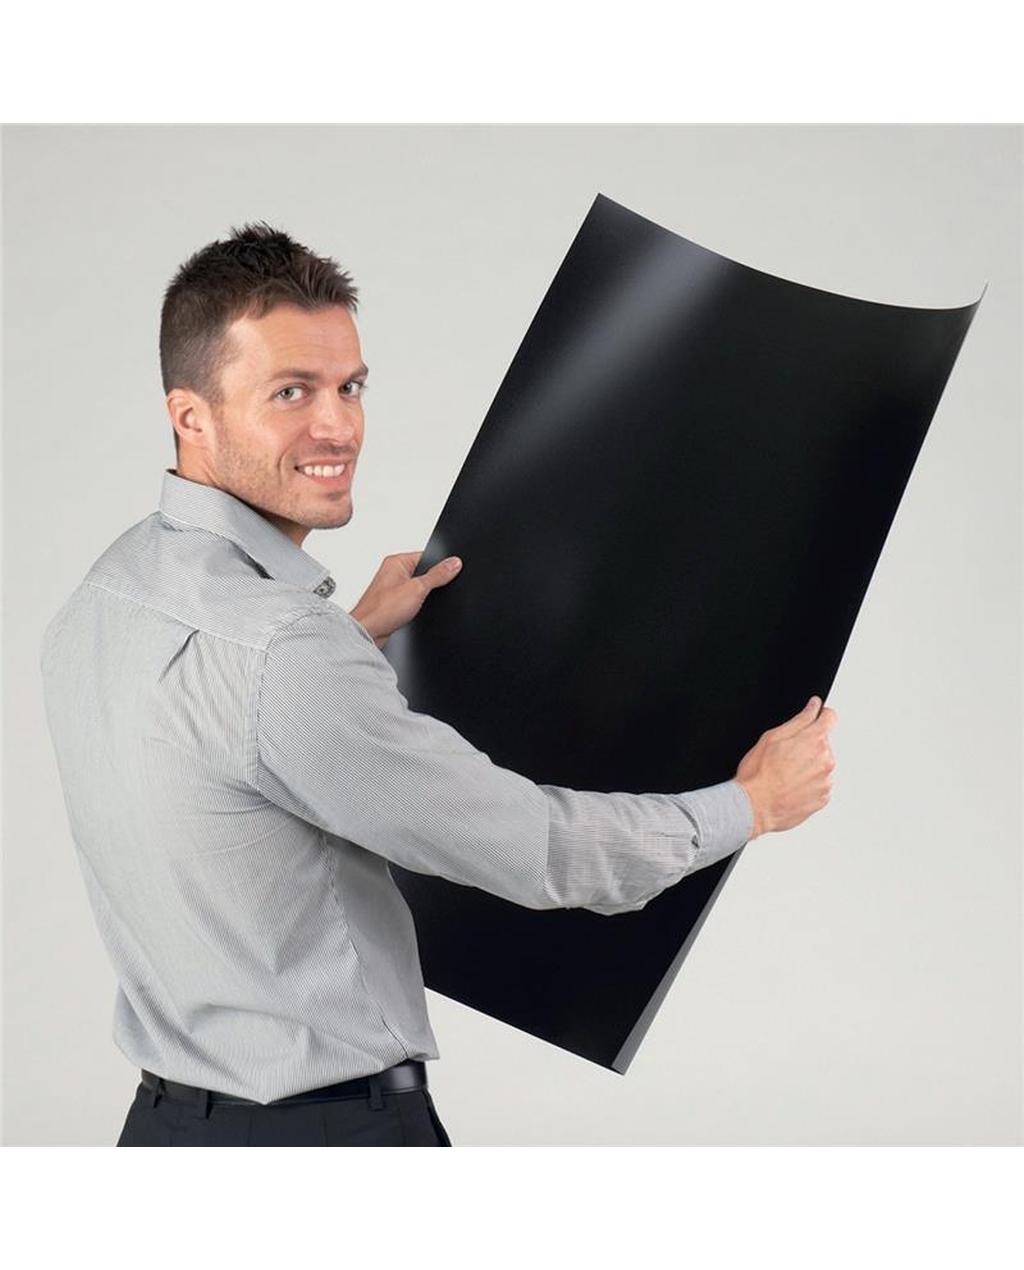 A Frame A1 Blackboard Inserts